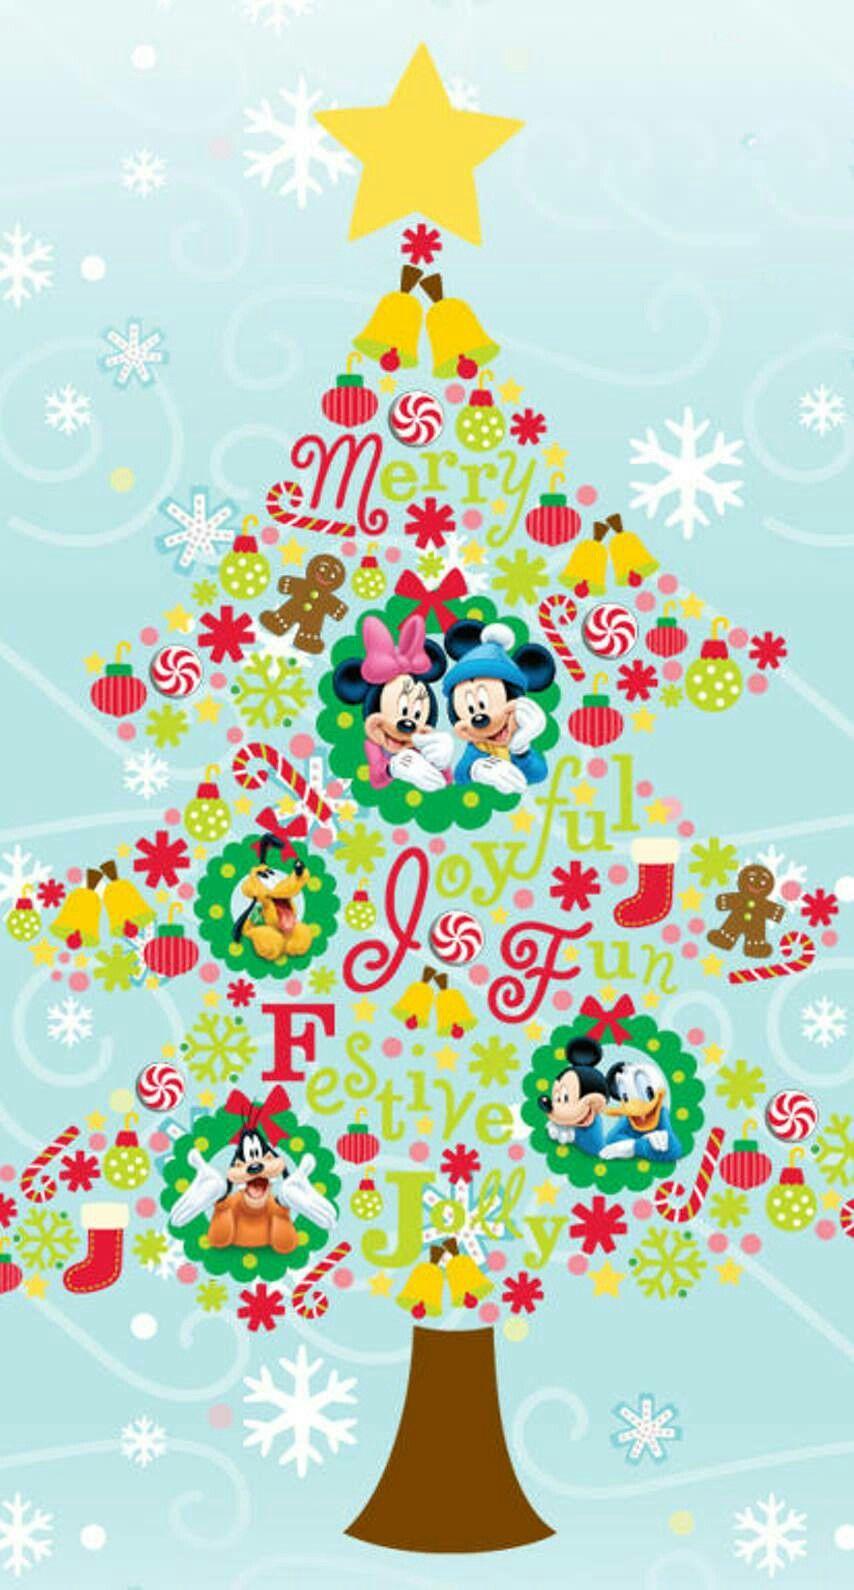 Merry Christmas Disney Disney Christmas Wallpaper Iphone Christmas Mickey Christmas